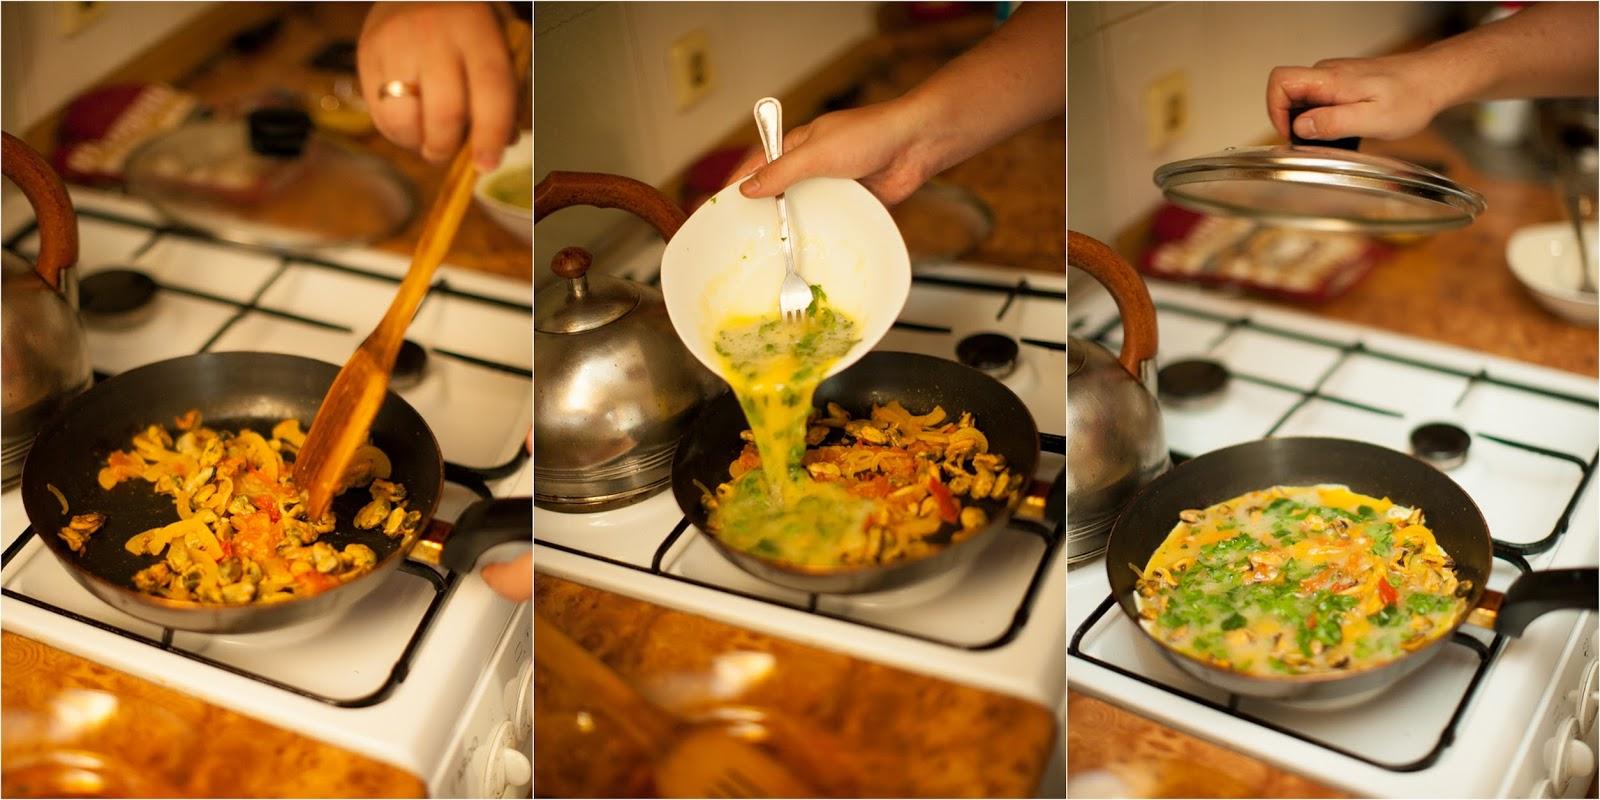 яйца на ужин совет диетолога